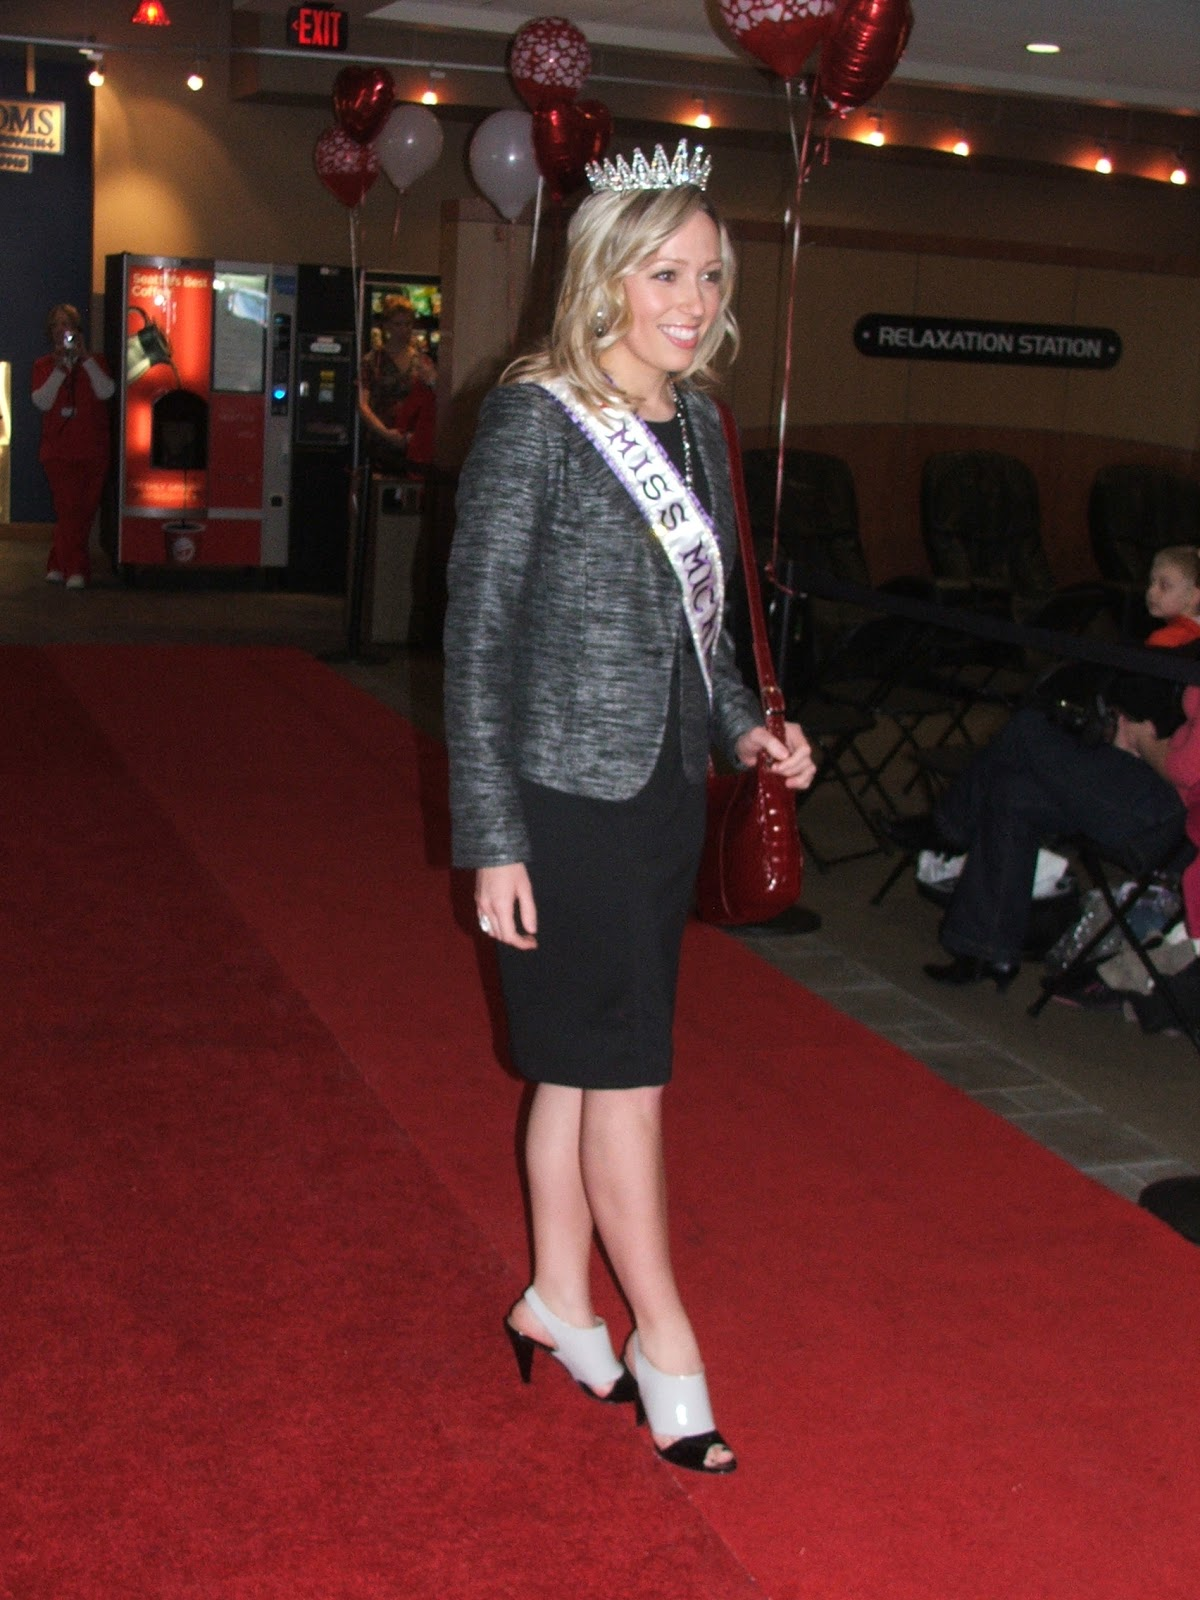 Miss Michigan International 2012: Go Red Fashion Show